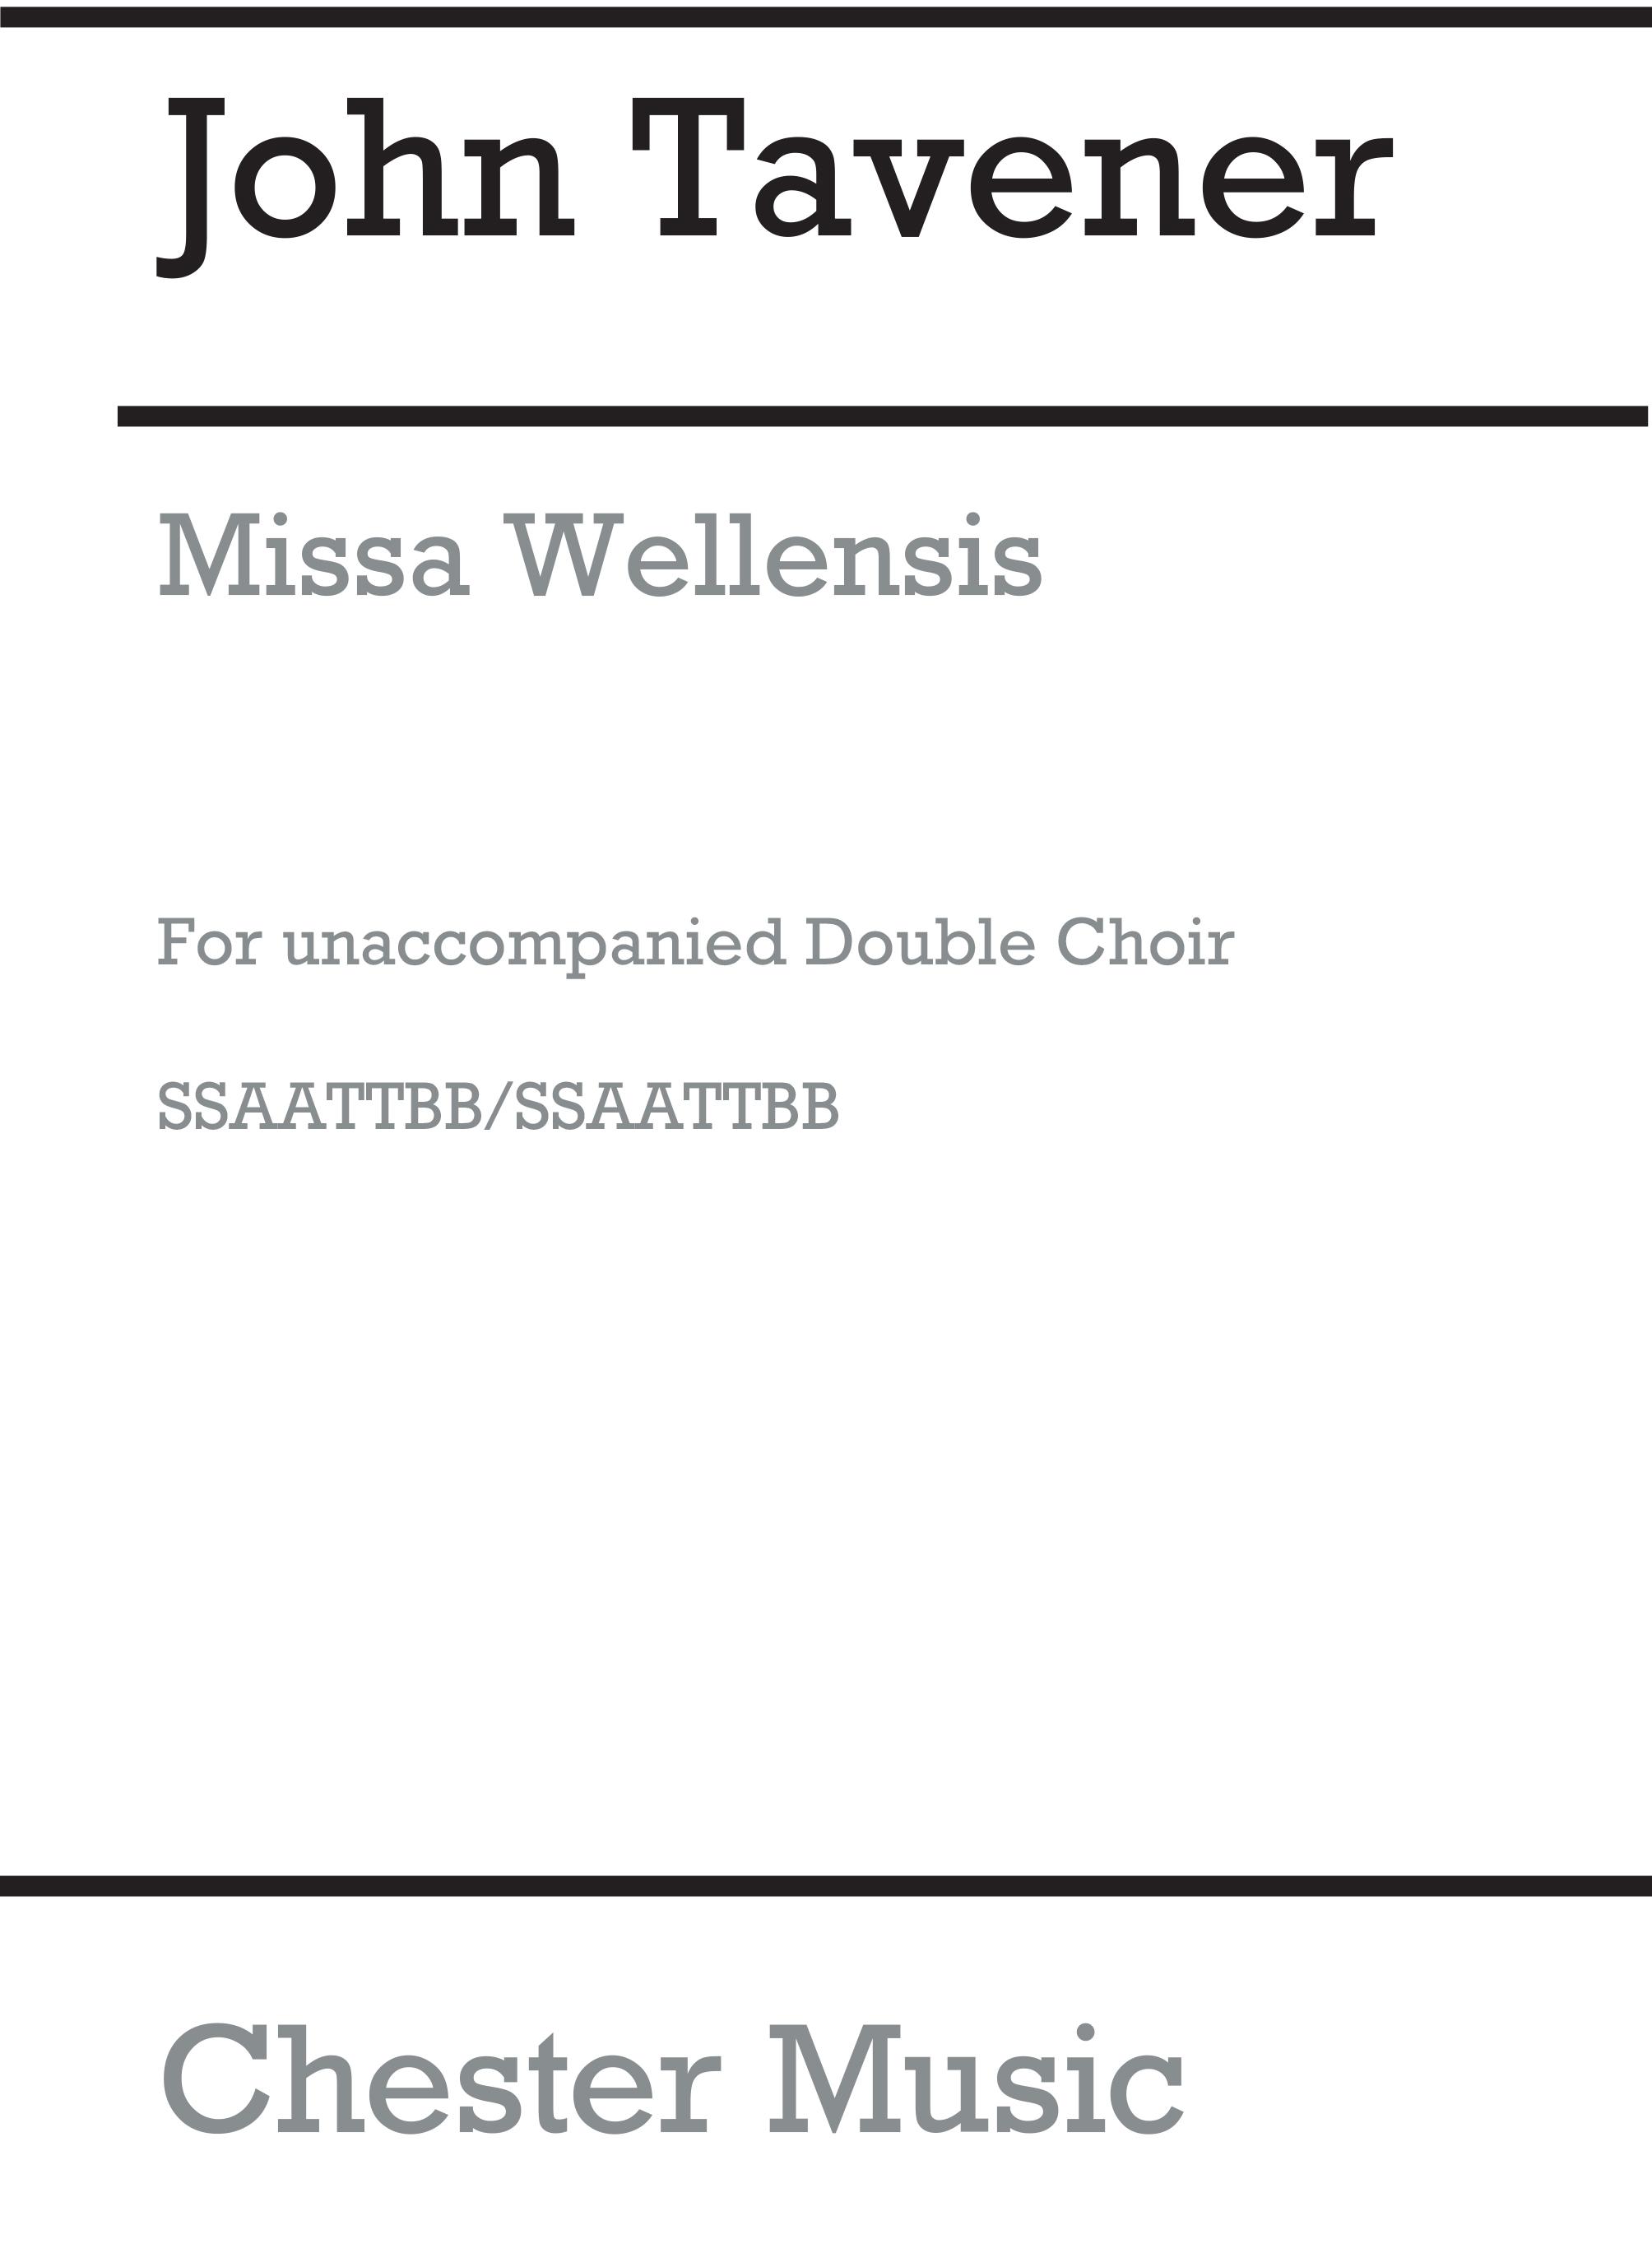 John Tavener: Missa Wellensis: SATB: Vocal Score